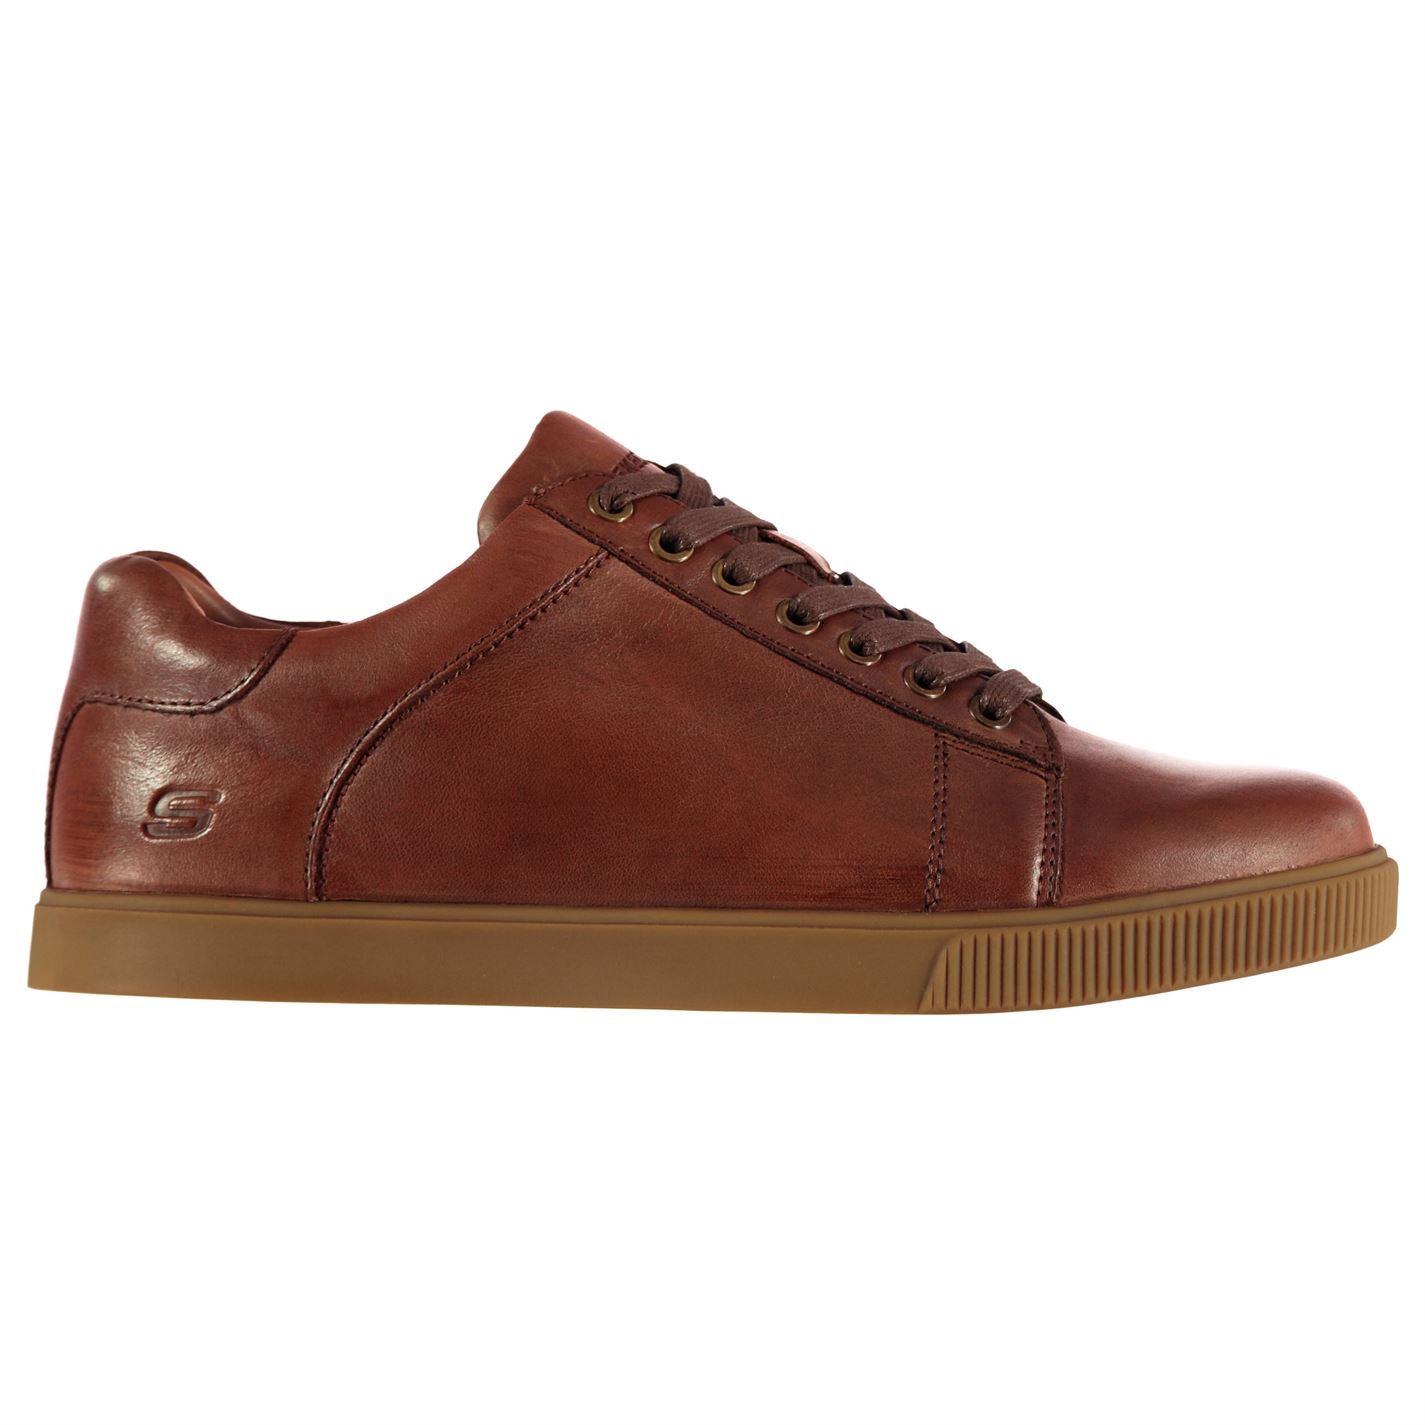 Skechers-Vol-Fandom-Homme-Chaussures-Baskets-decontractees-chaussures-baskets miniature 13